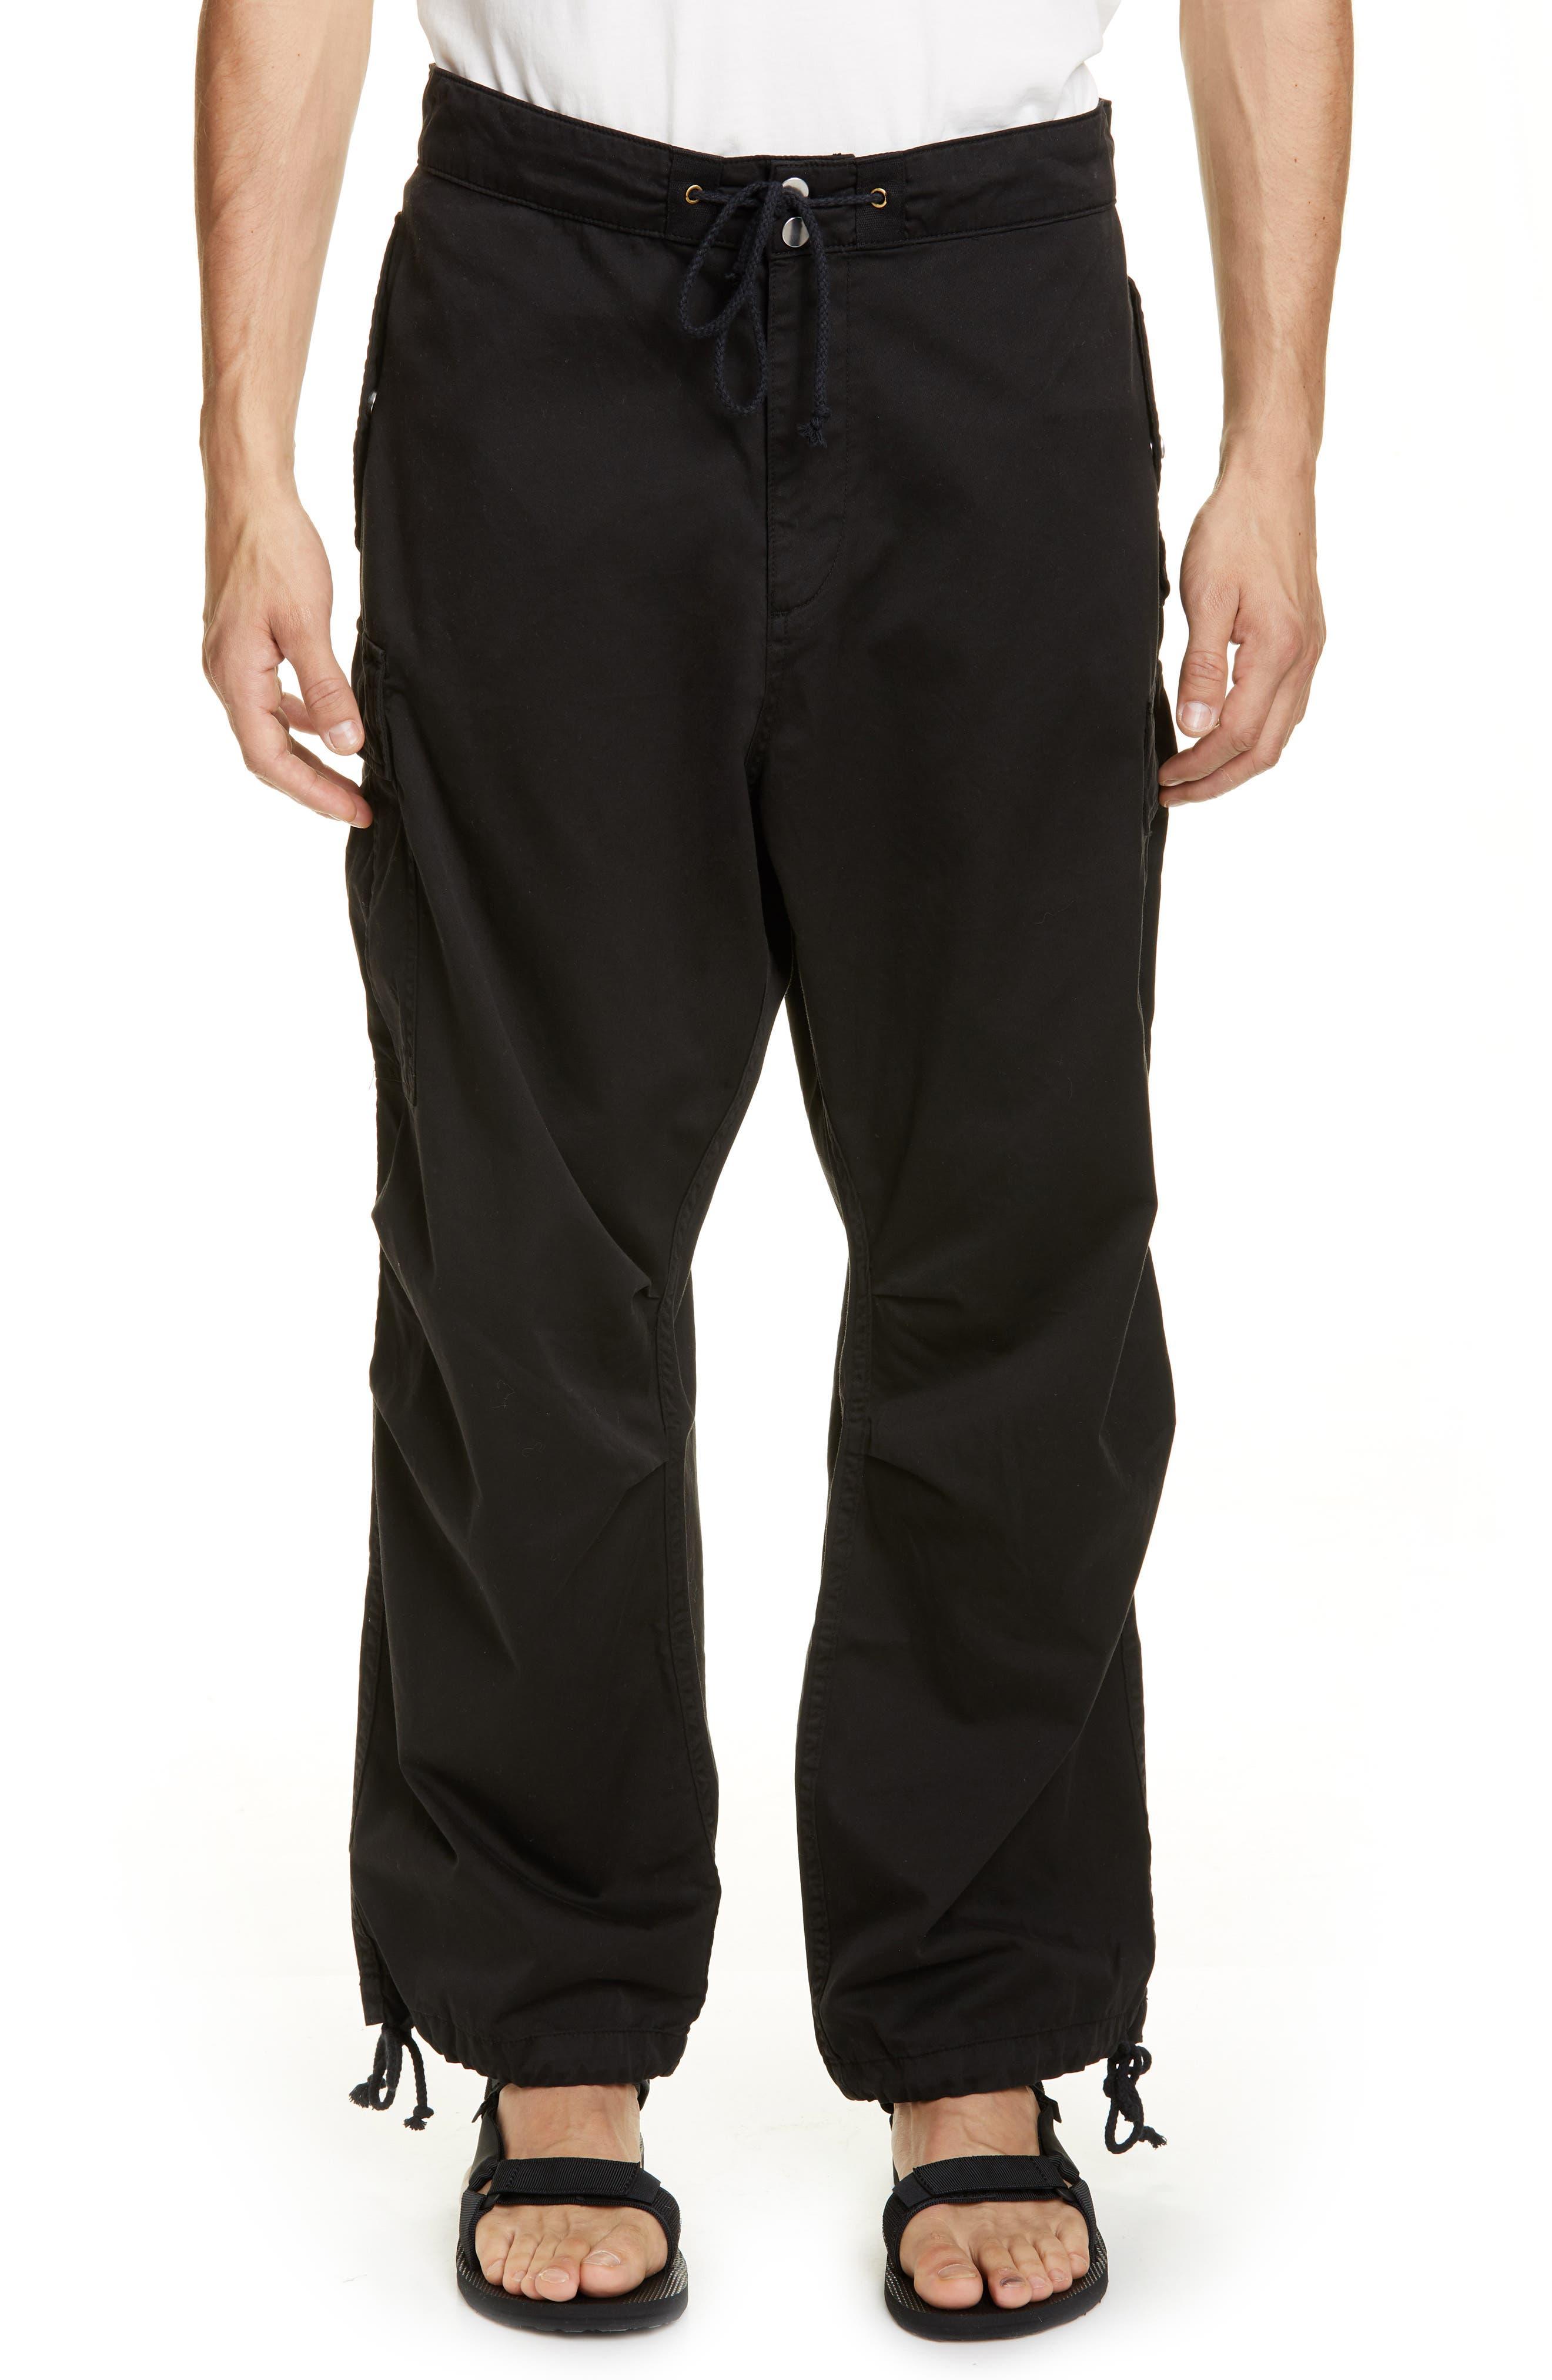 Billy Los Angeles Parachute Cargo Pants, Black